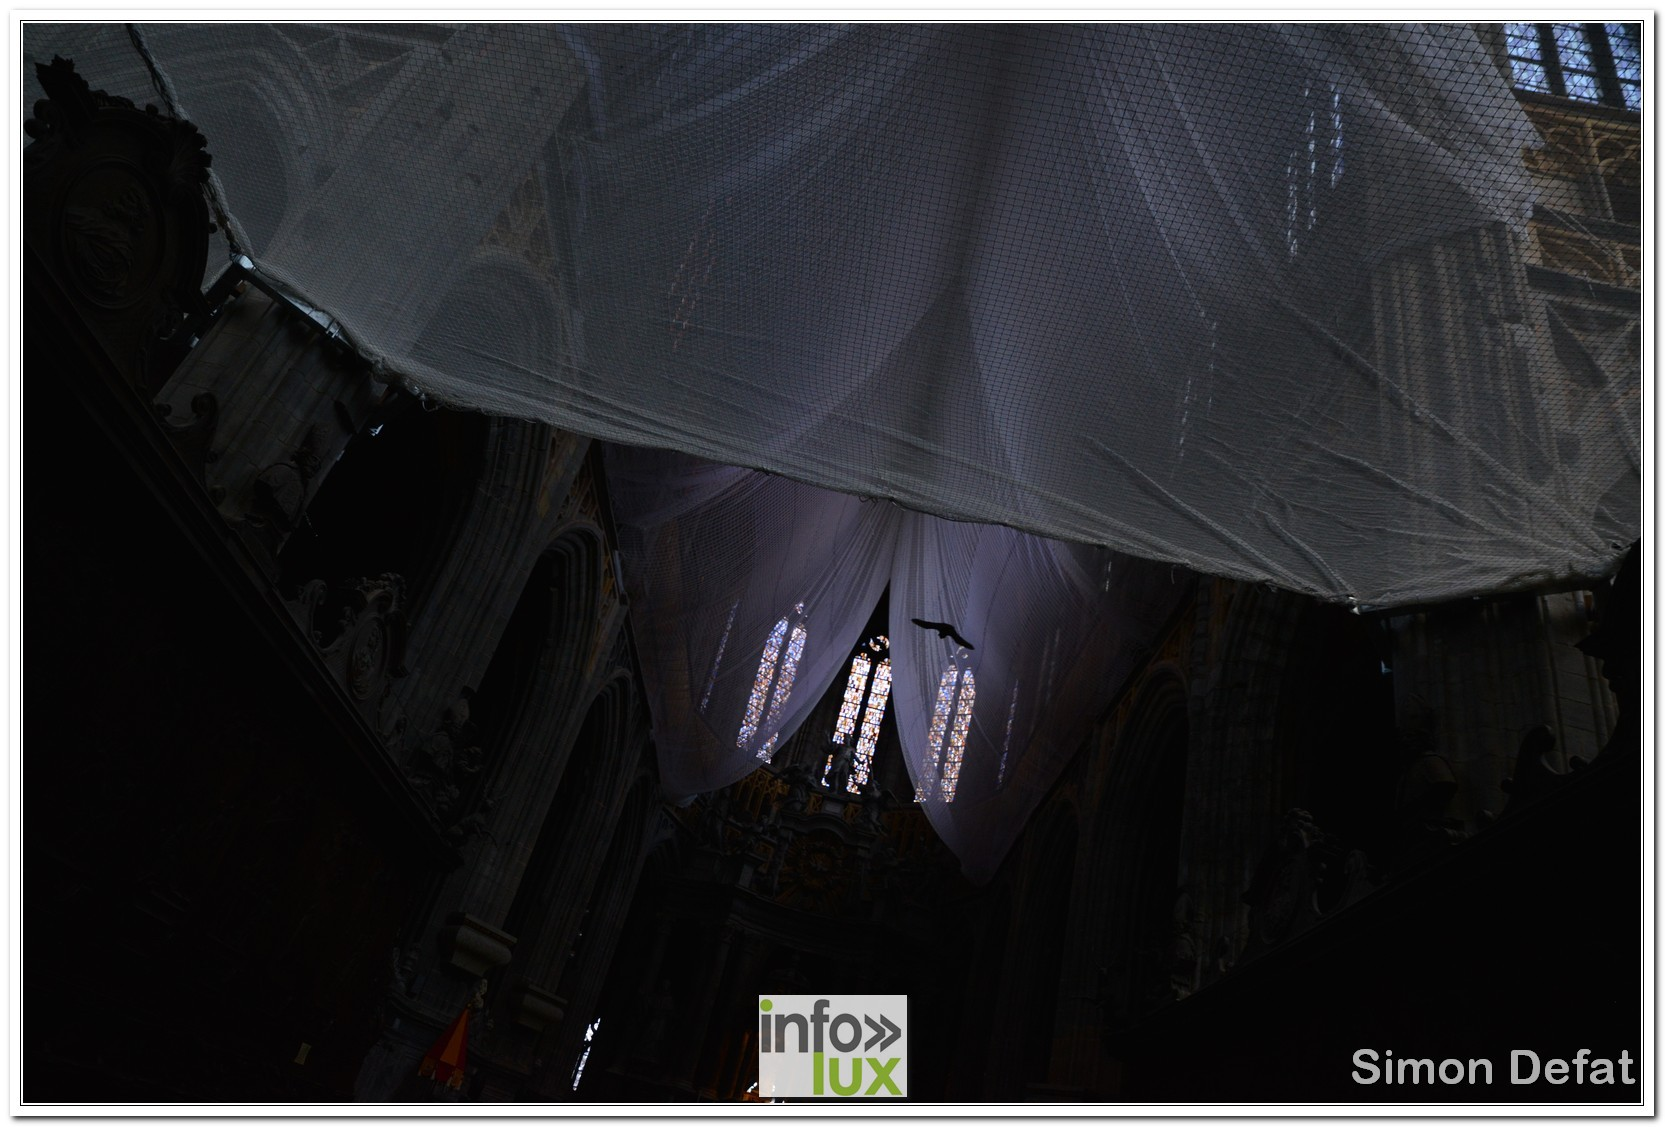 images/2018sainthubertchasse/DSC_1118